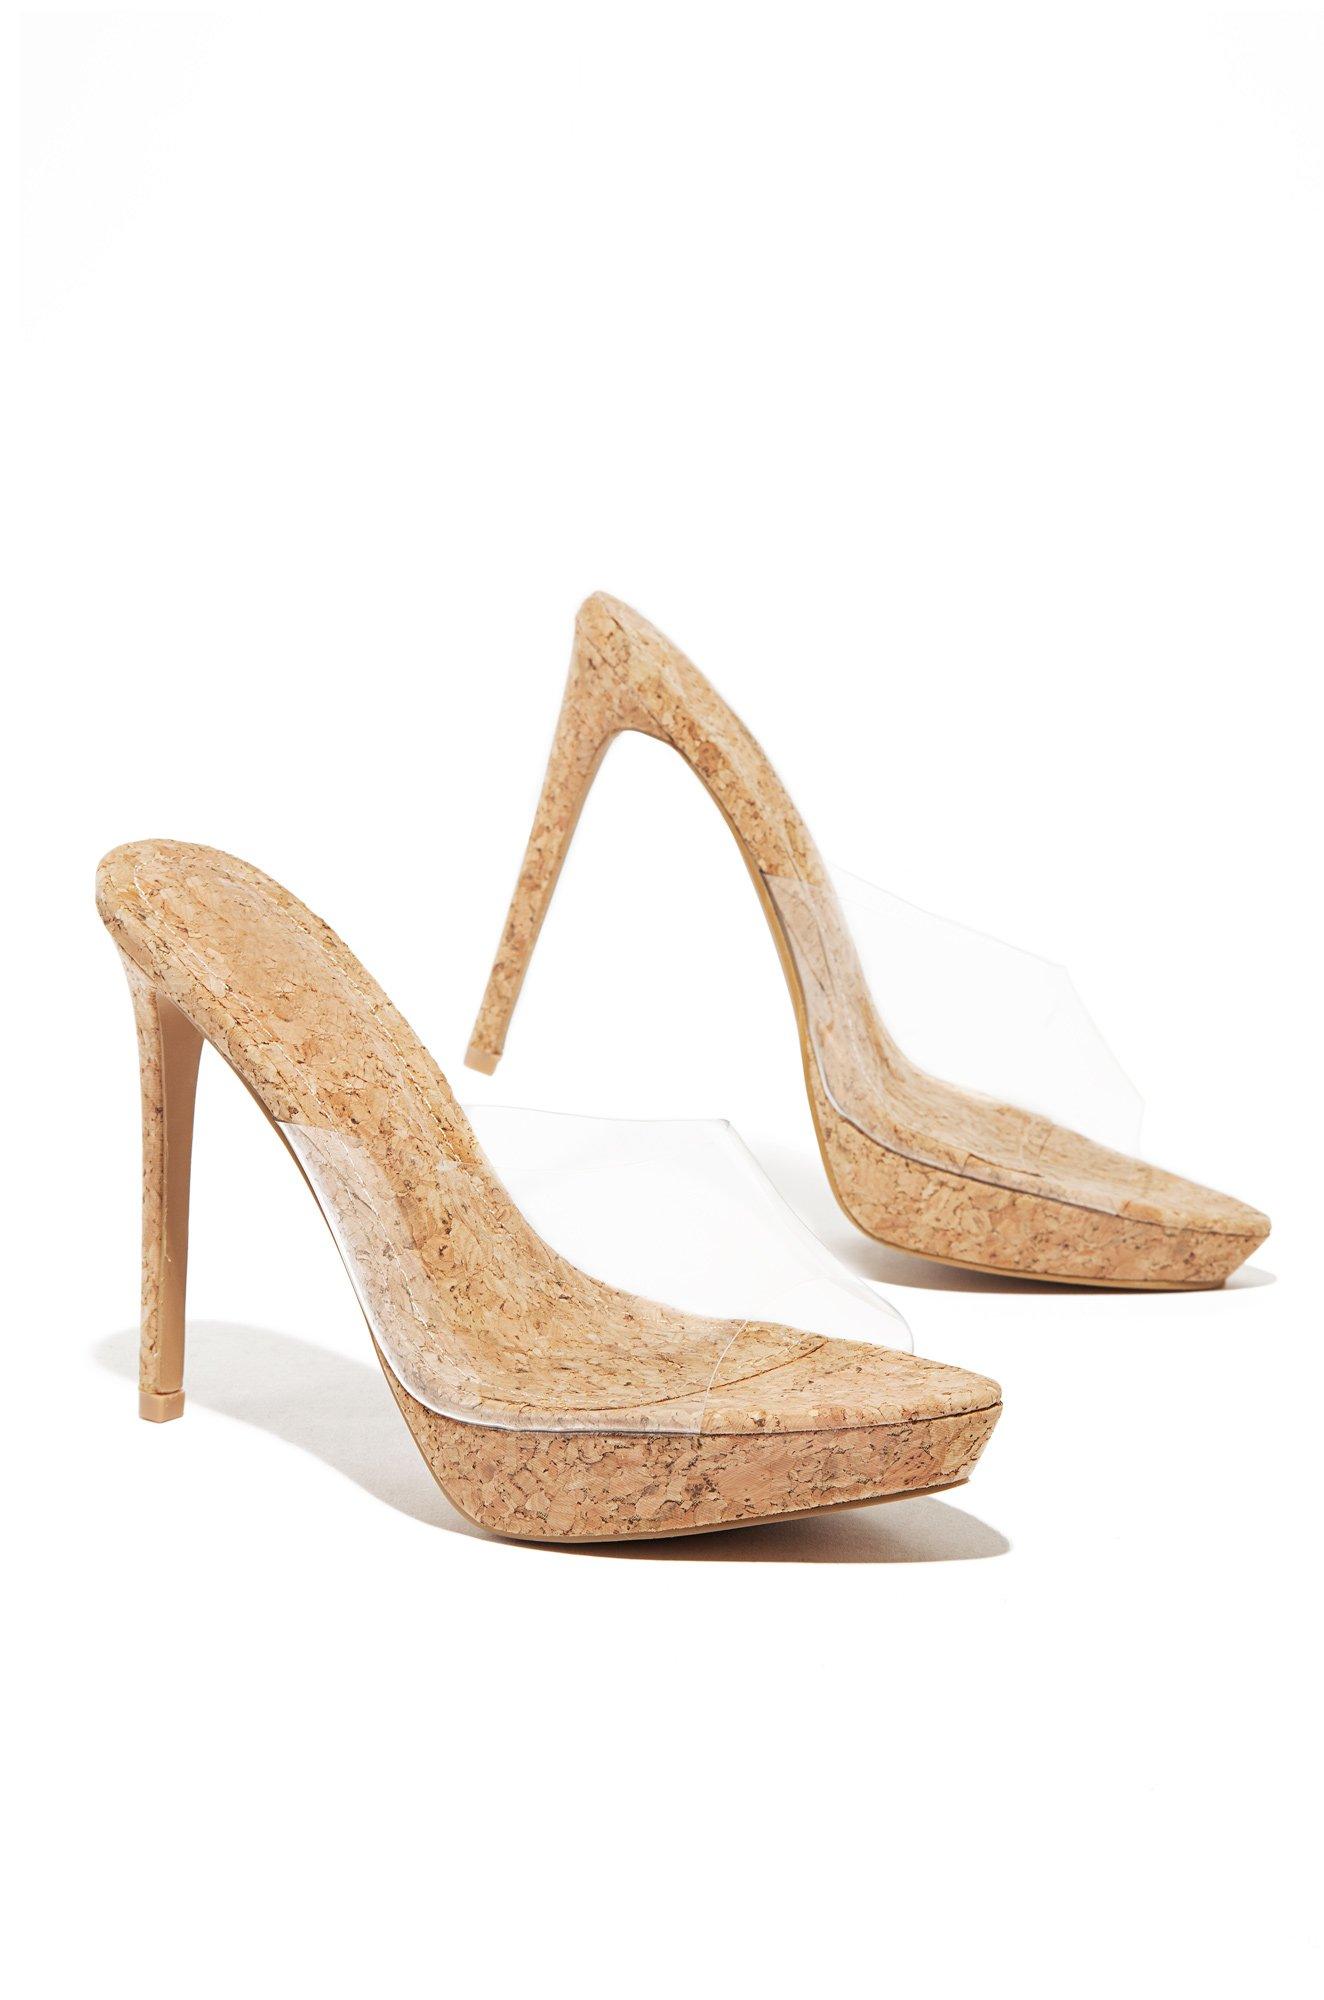 041cc4c2604 Details about Cape Robbin Worship Cork Clear Wrap Comfortable Open Toe  Stiletto Heeled Sandals